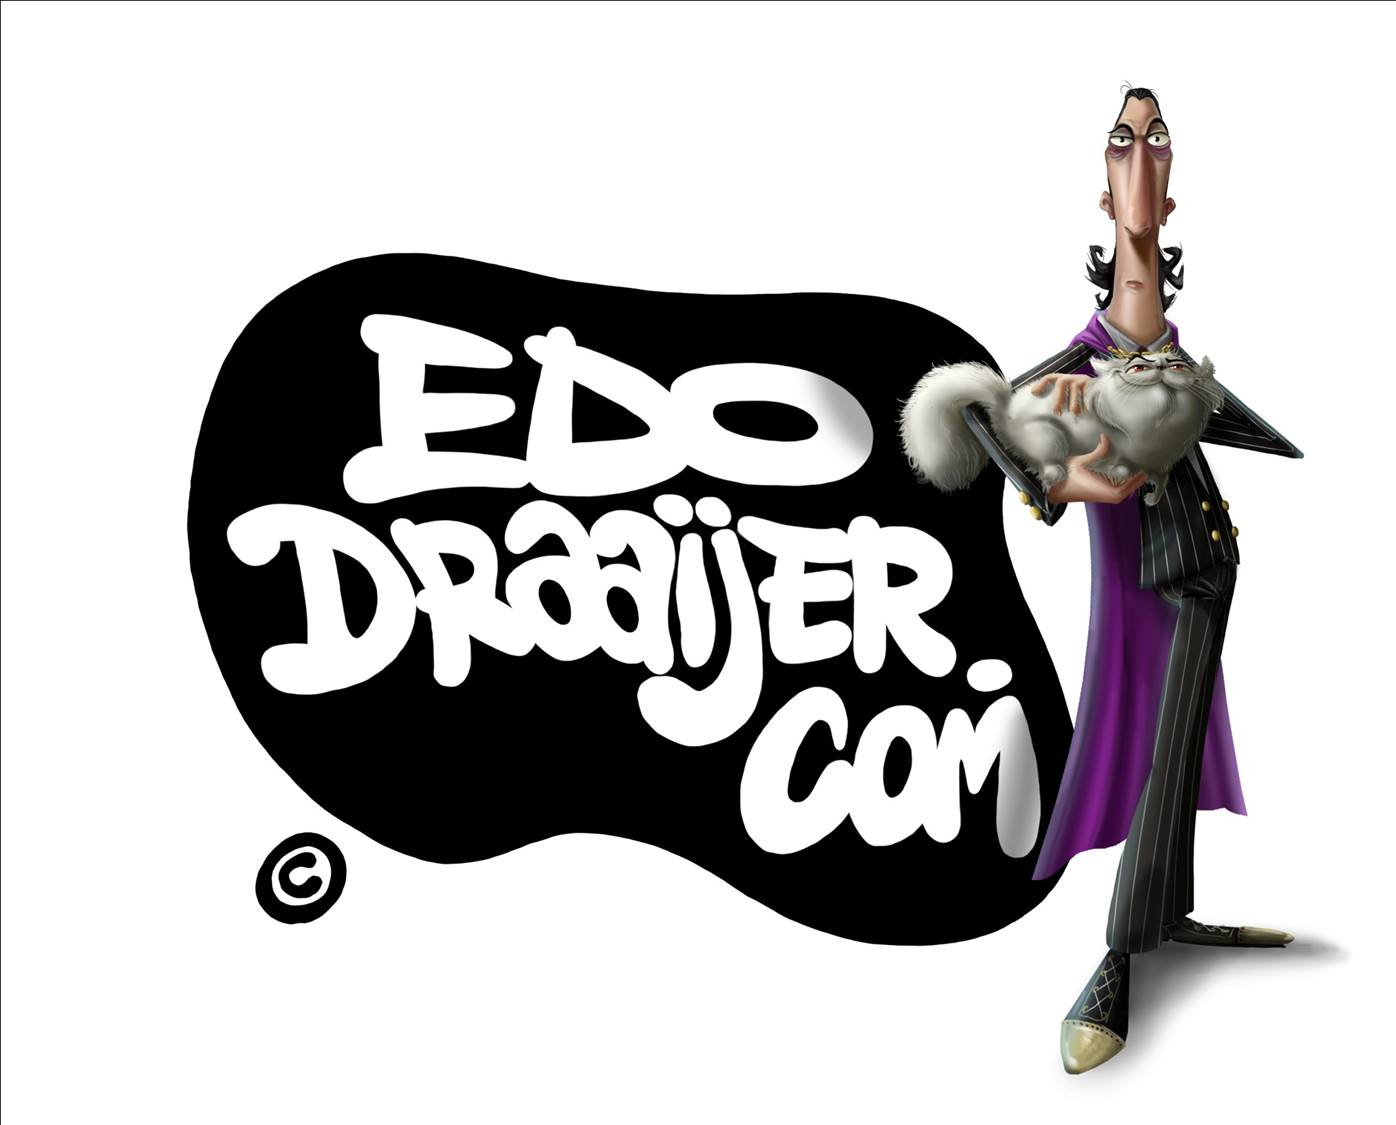 Edo Draaijer Studios Deventer